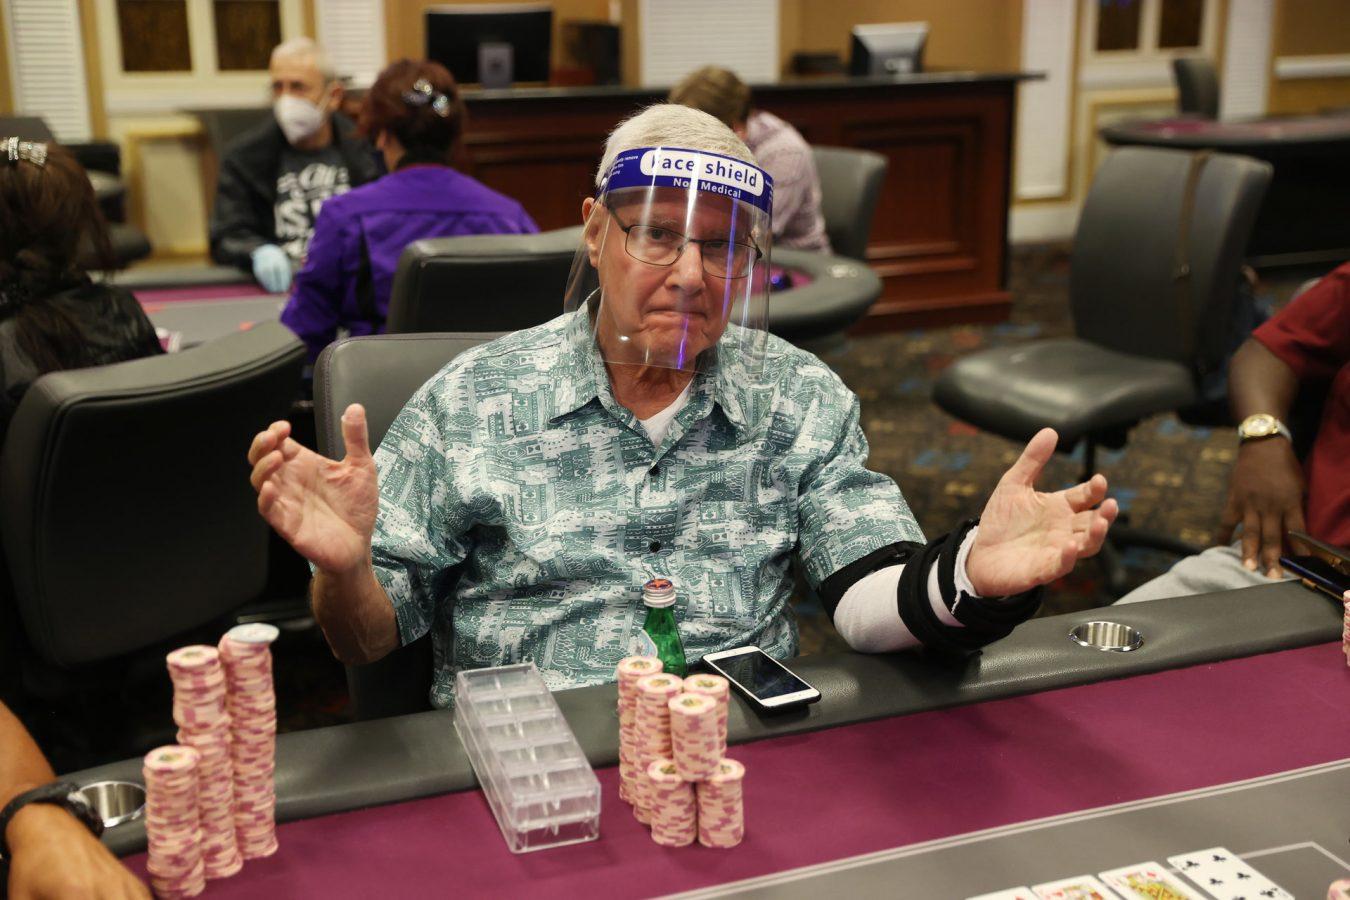 Kasino Las Vegas menyambut kembali pemain poker